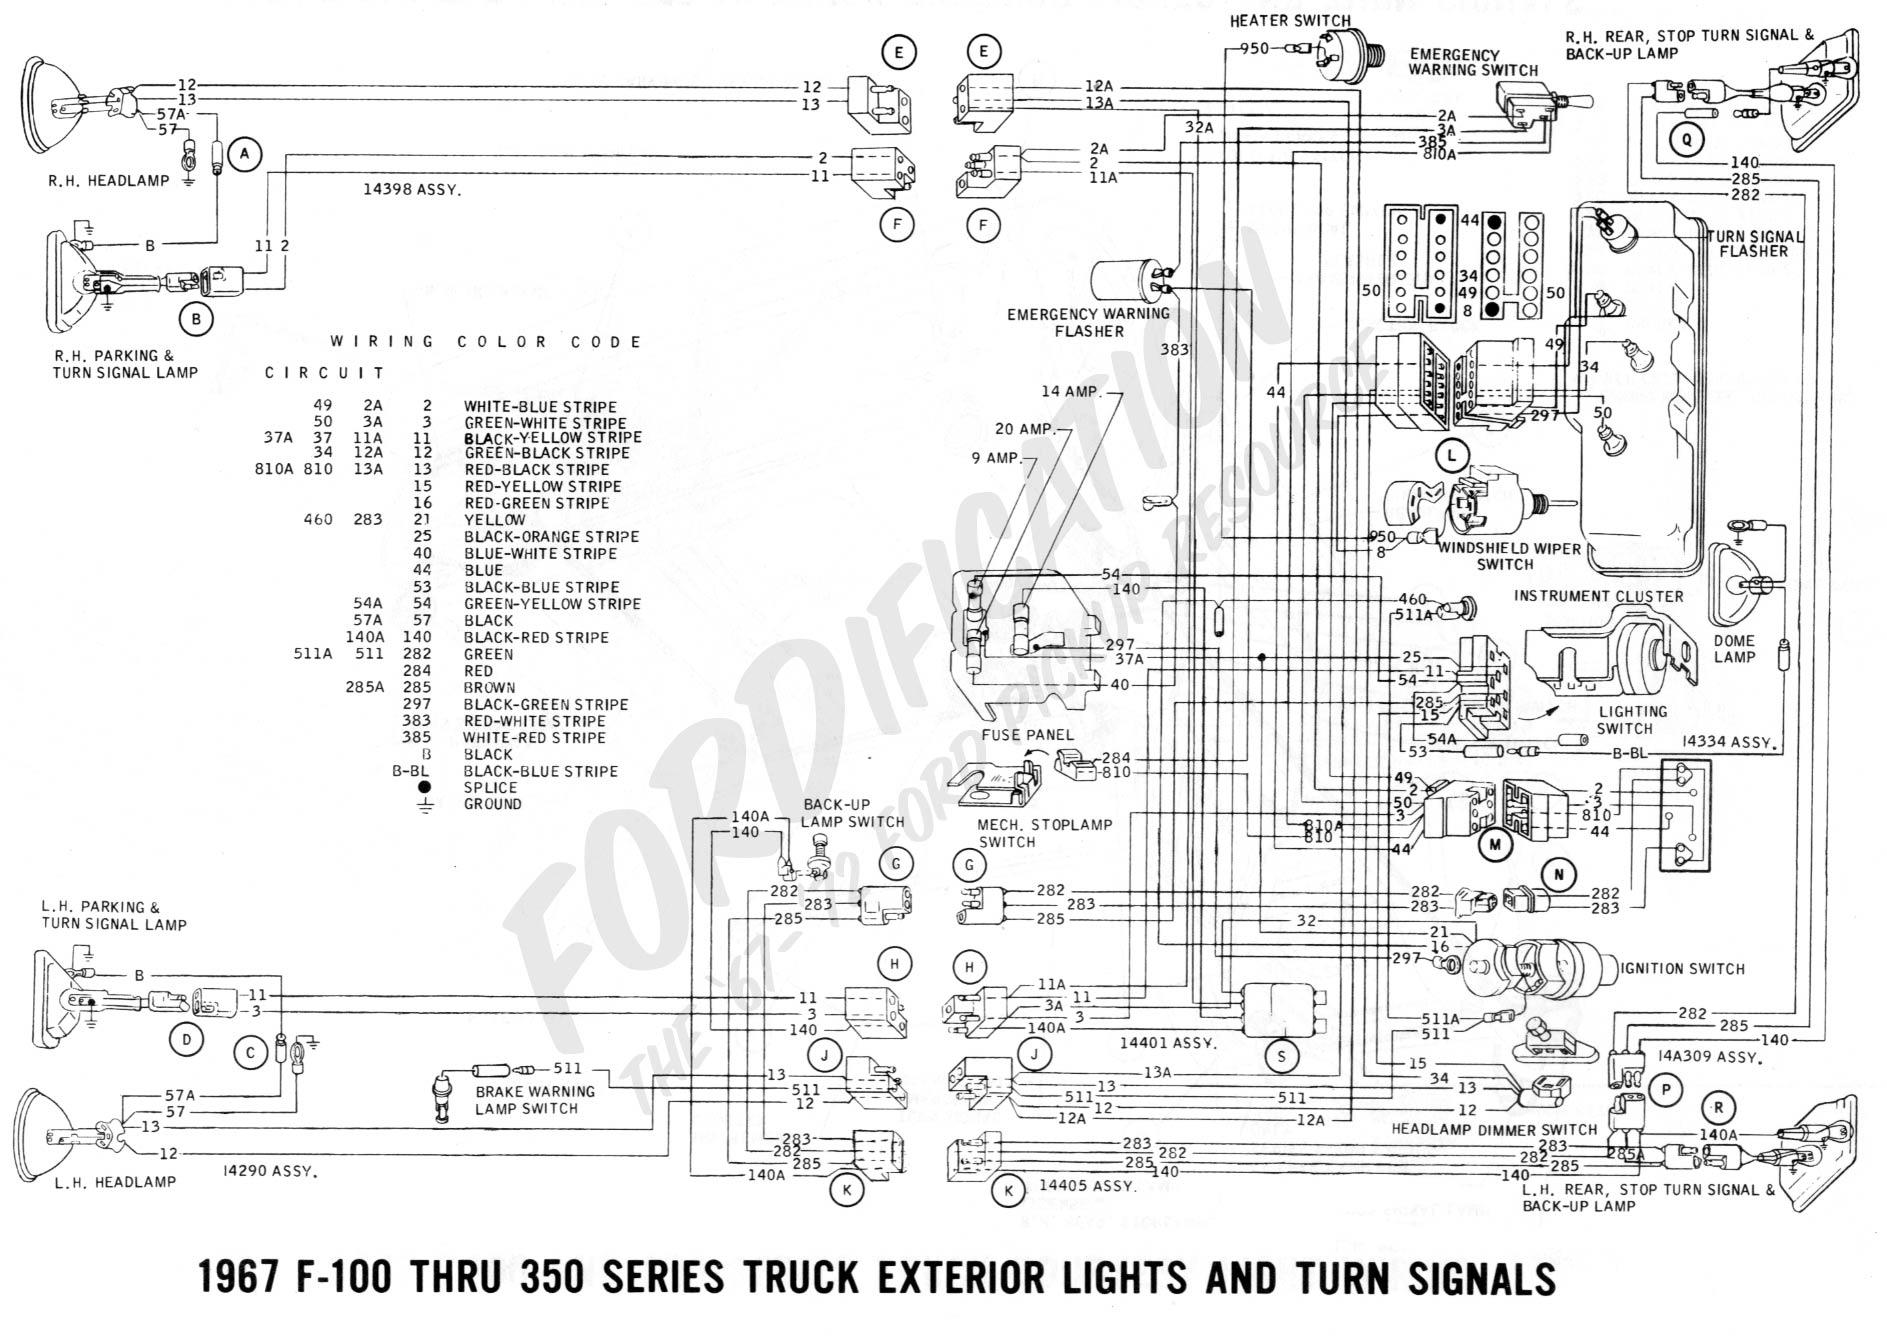 Adr Wiring Diagram For 06 250x Dbw Dirtbikeworld Members - 350 Chevy Engine Wiring  Diagram Related Keywords Suggestions - viiintage.bmw1992.warmi.fr   Adr Wiring Diagram For 06 250x Dbw Dirtbikeworld Members      Wiring Diagram Resource